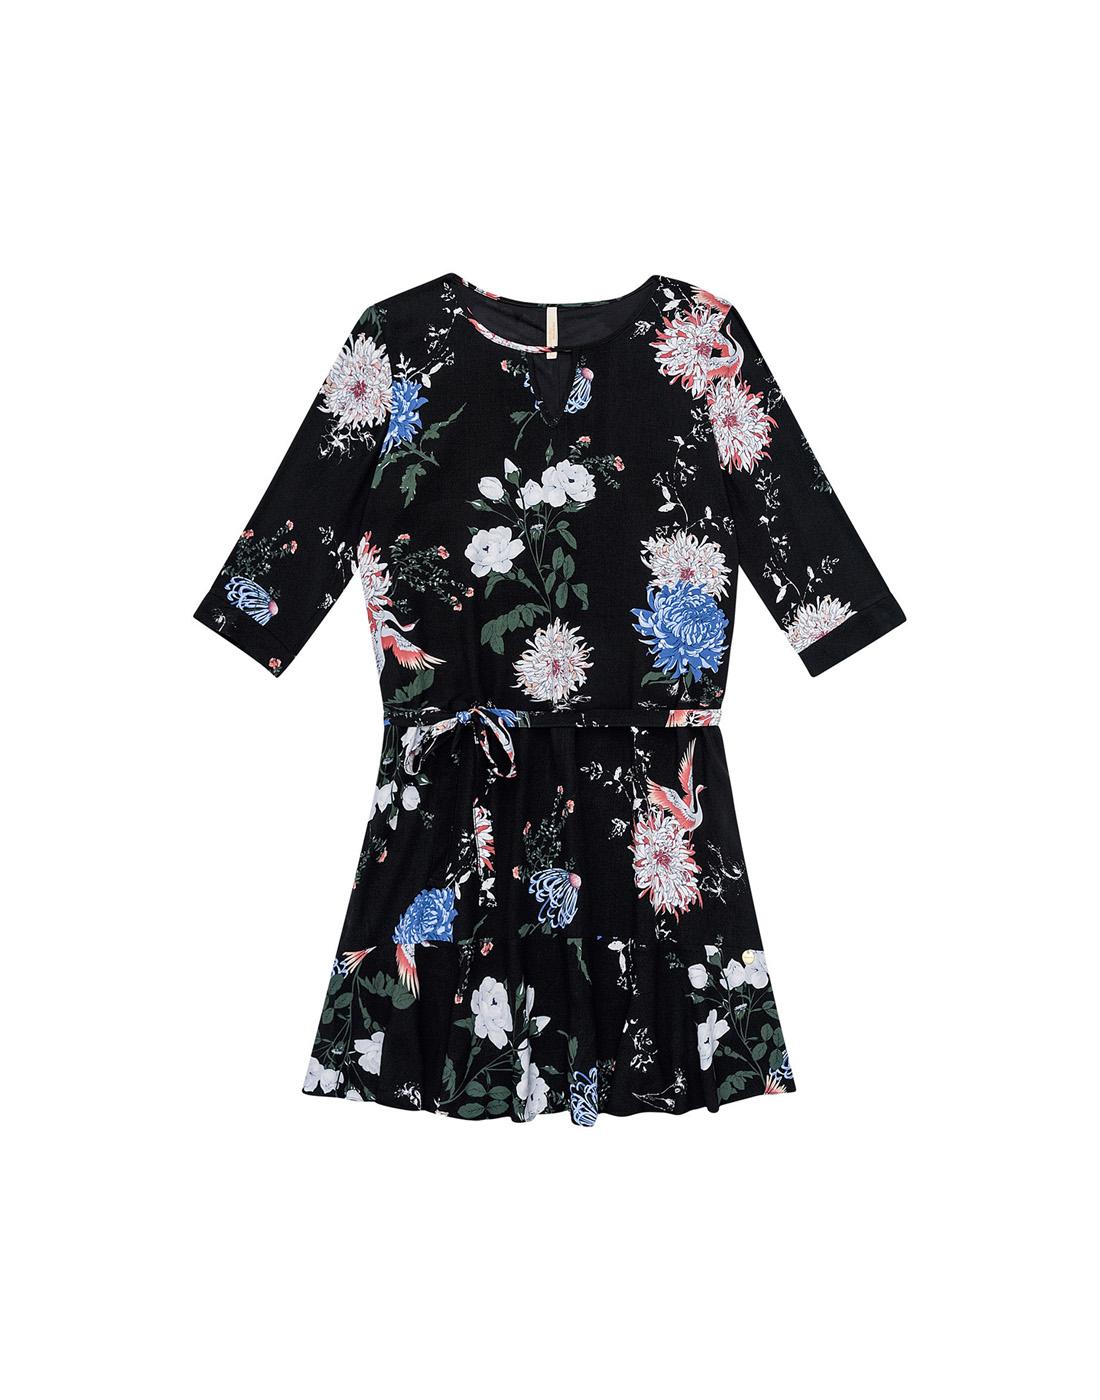 Vestido Tecido Rayon Bali Preto Reativo Lunender Mais Mulher